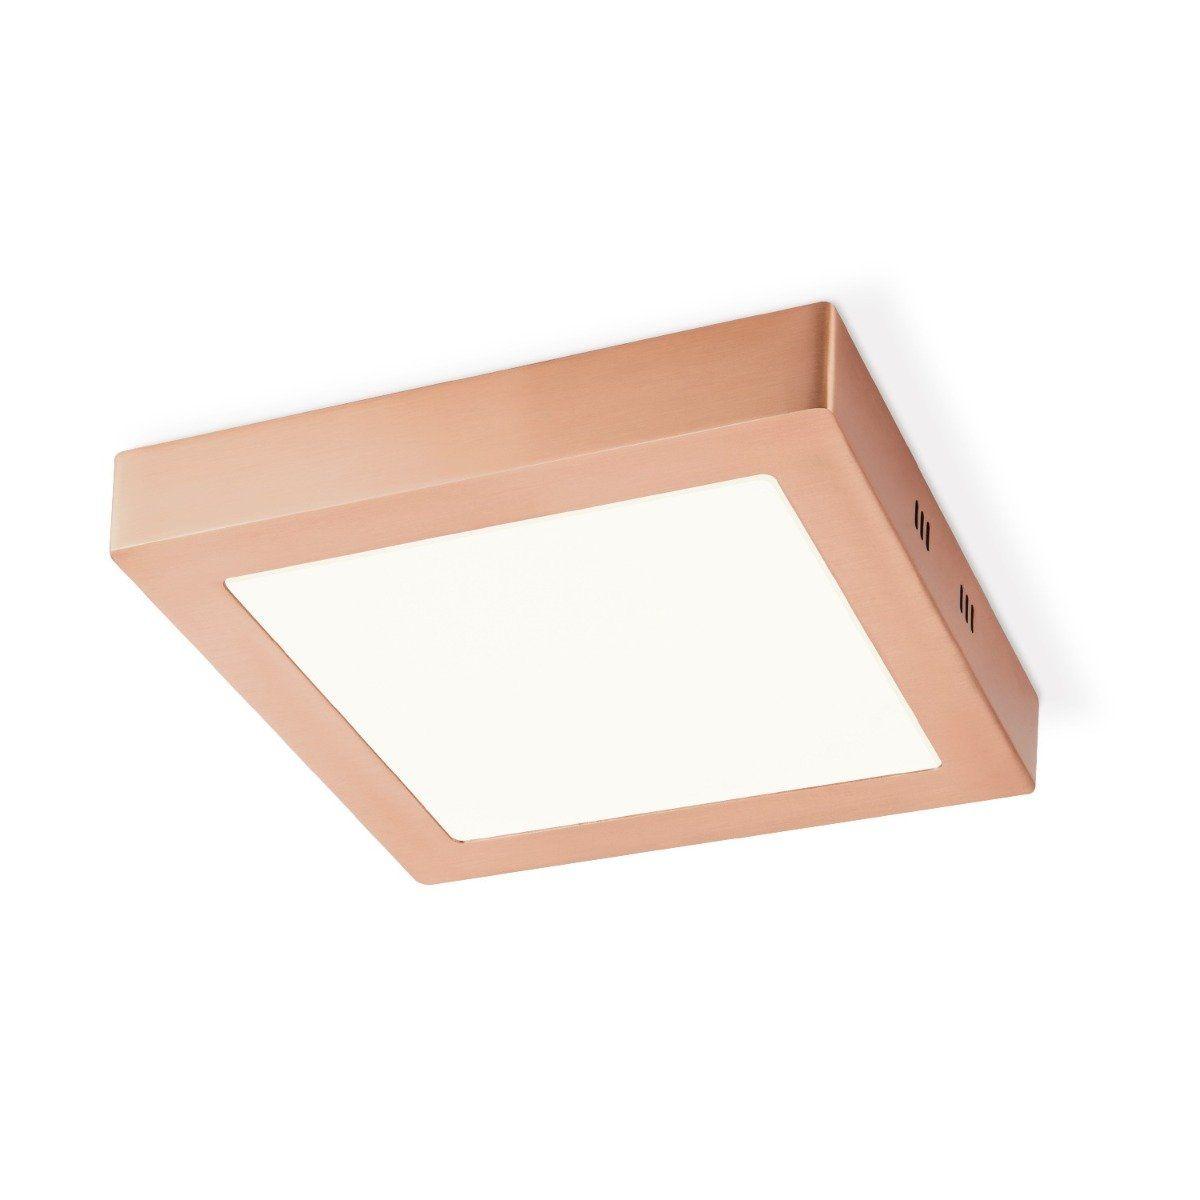 Home sweet home LED plafondlamp Ska vierkant 22,5 - koper